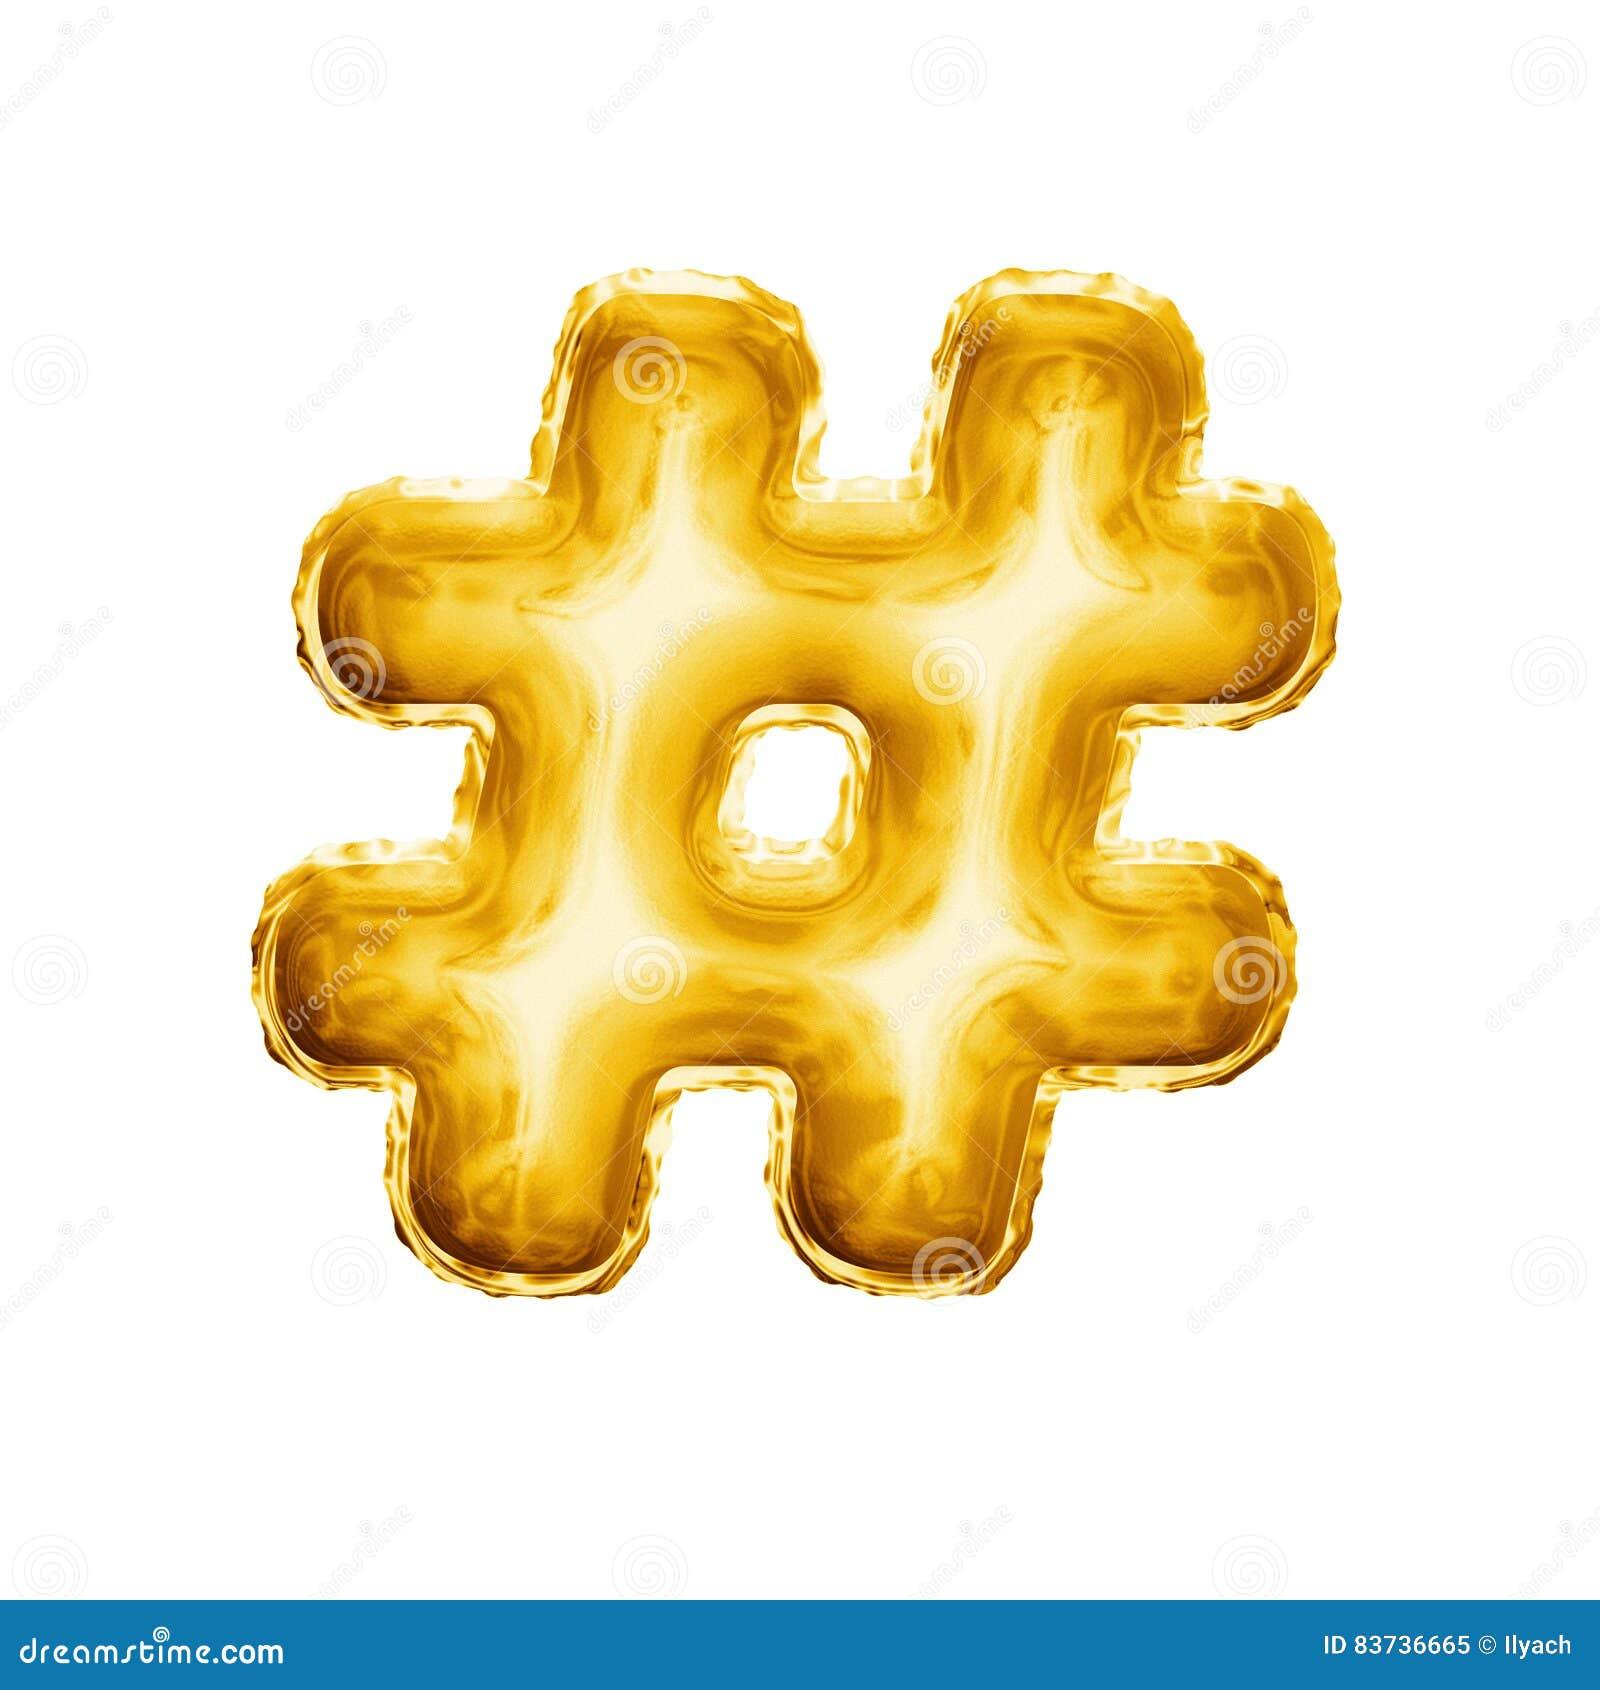 Balloon Hashtag Number Sign Symbol 3d Golden Foil Realistic Alphabet